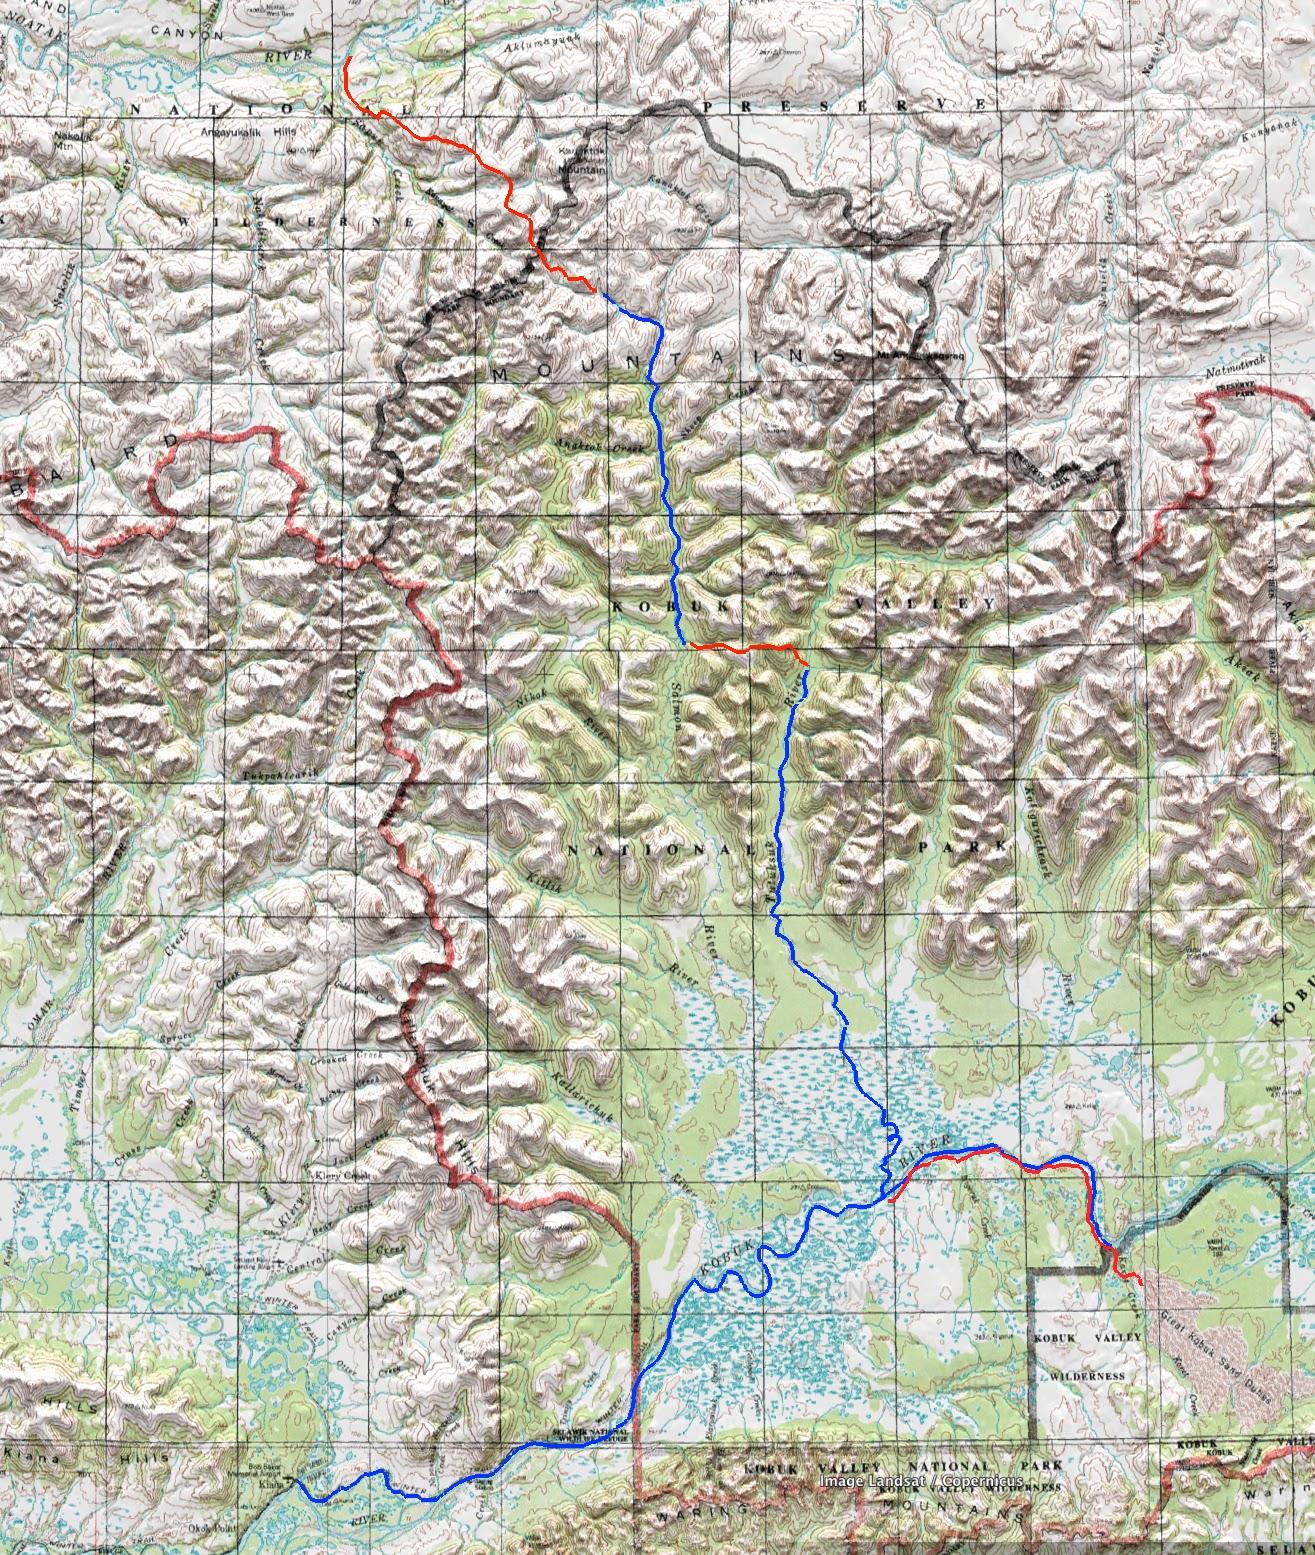 The Roaming Dials Kobuk Valley National Park June 2016 and Bering